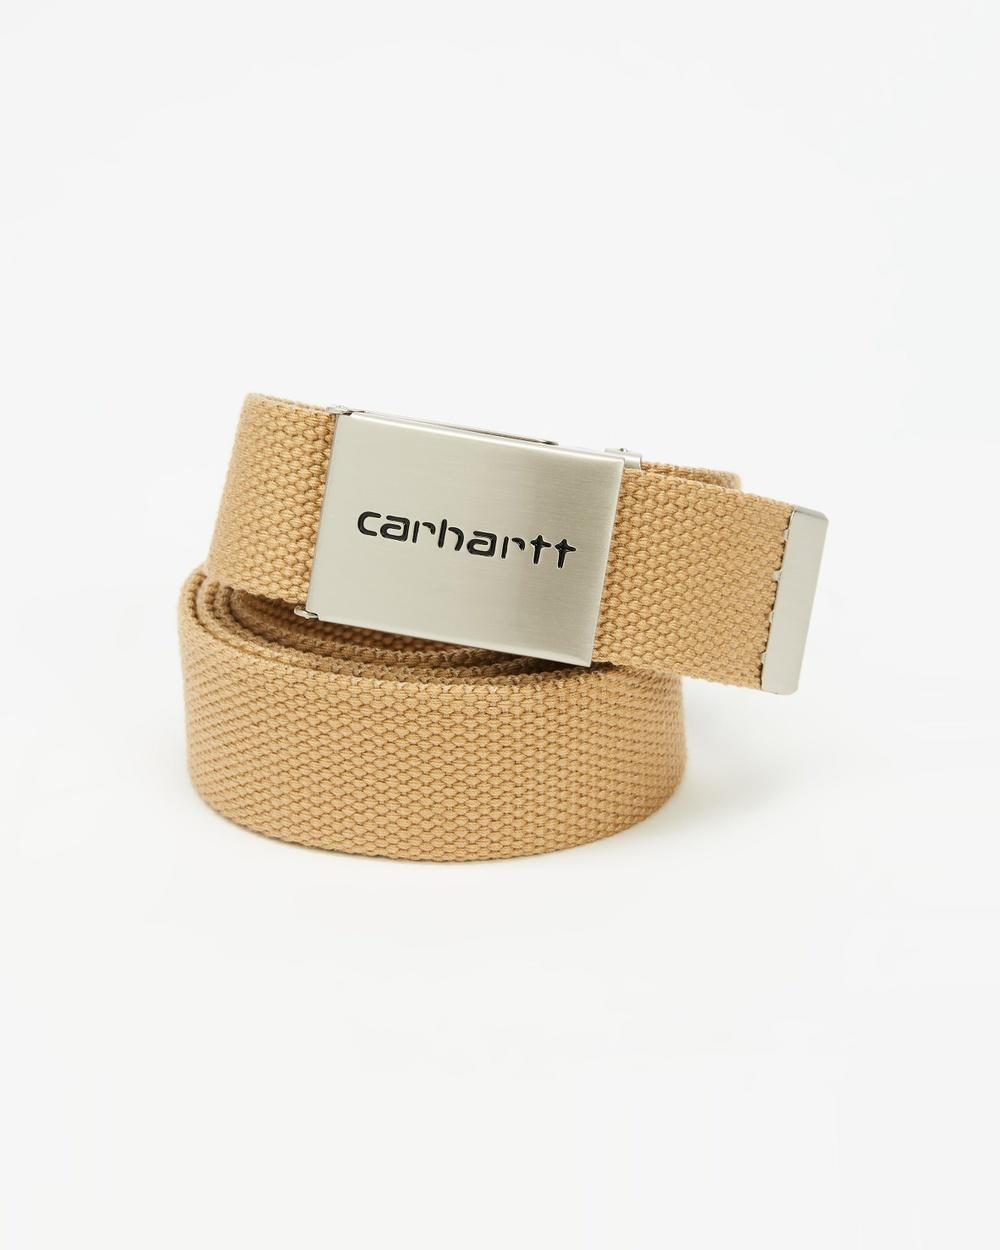 Carhartt Chrome Clip Belt Belts Dusty Hamilton Brown